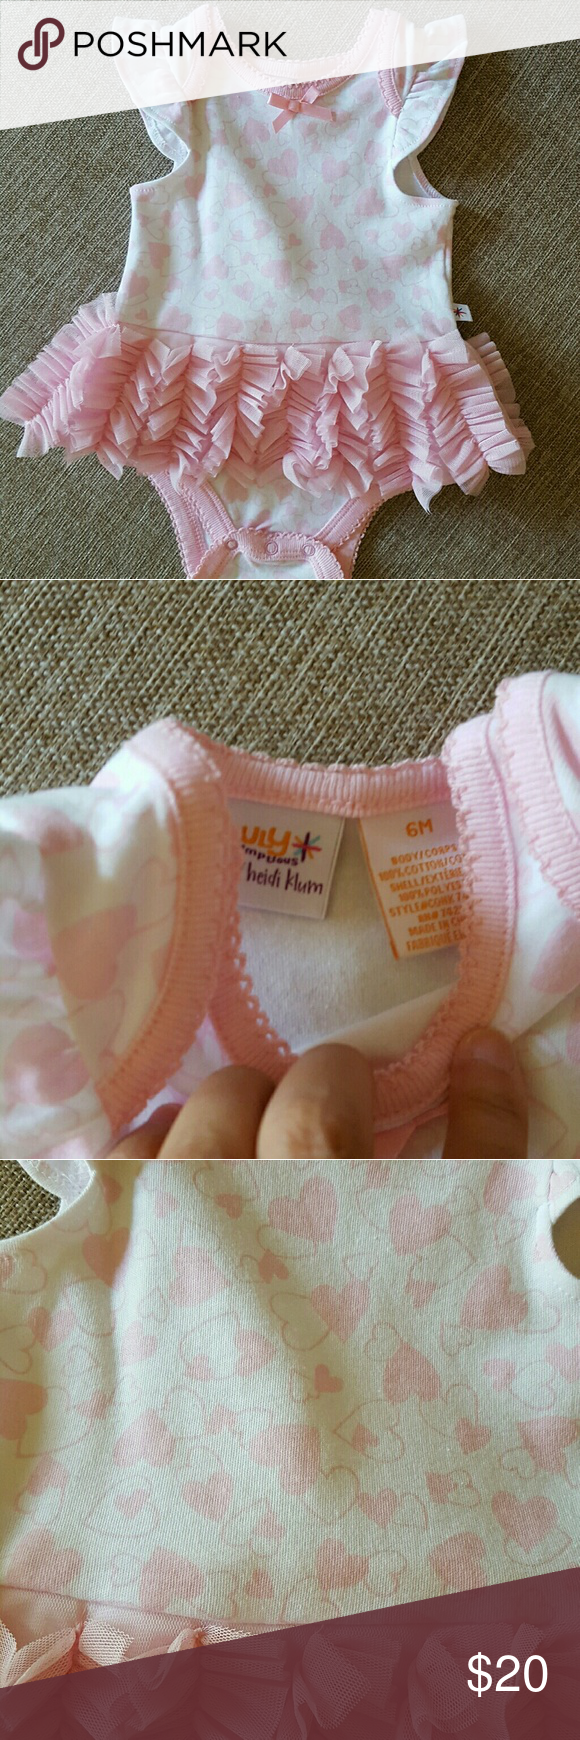 Baby onesie with attached skirt Ballerina onesie Truly Scrumptious by Heidi Klum Dresses Casual